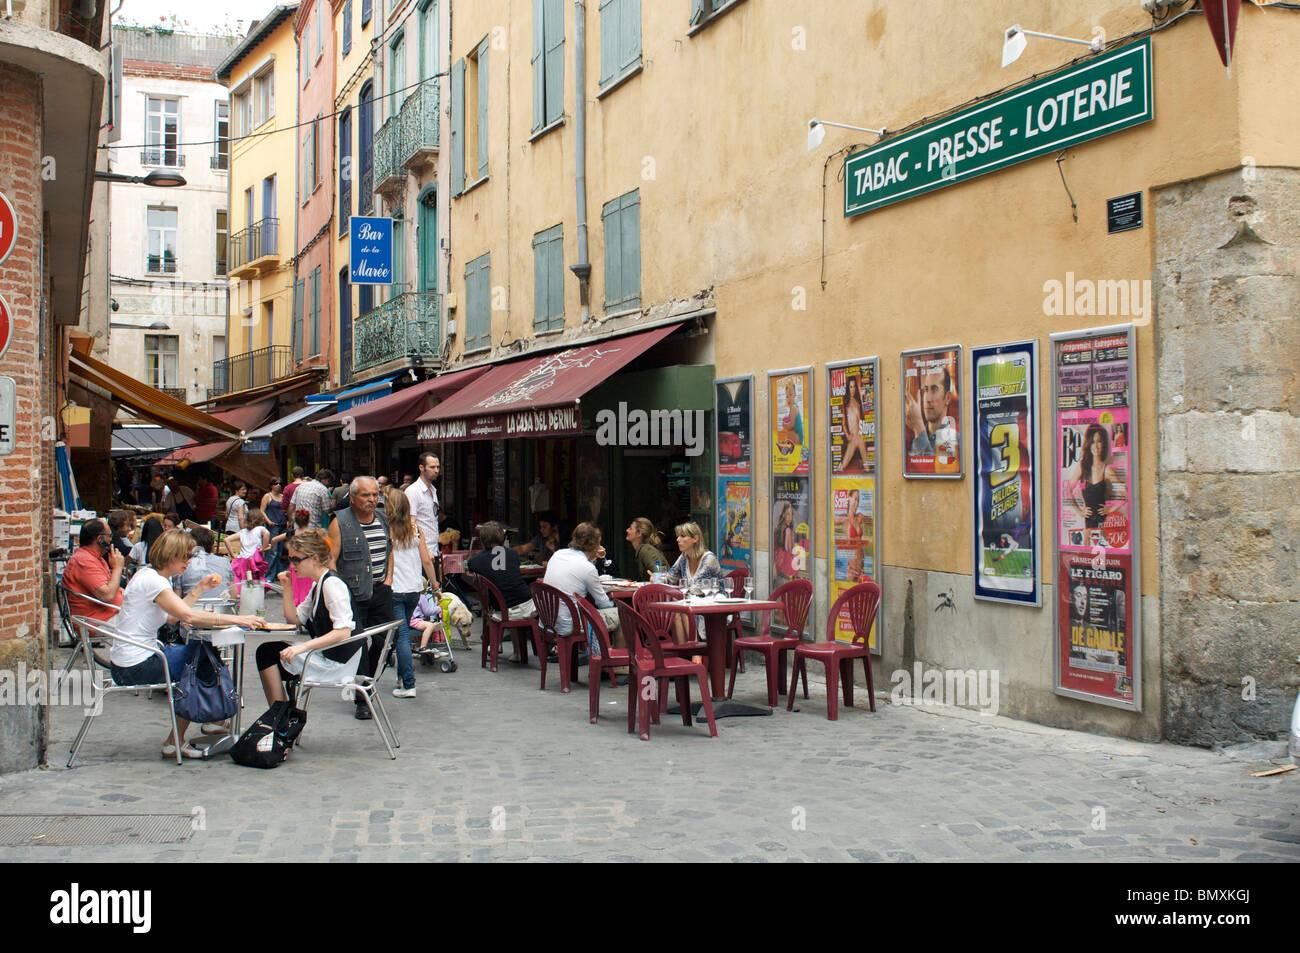 Scène de rue à perpignan Photo Stock